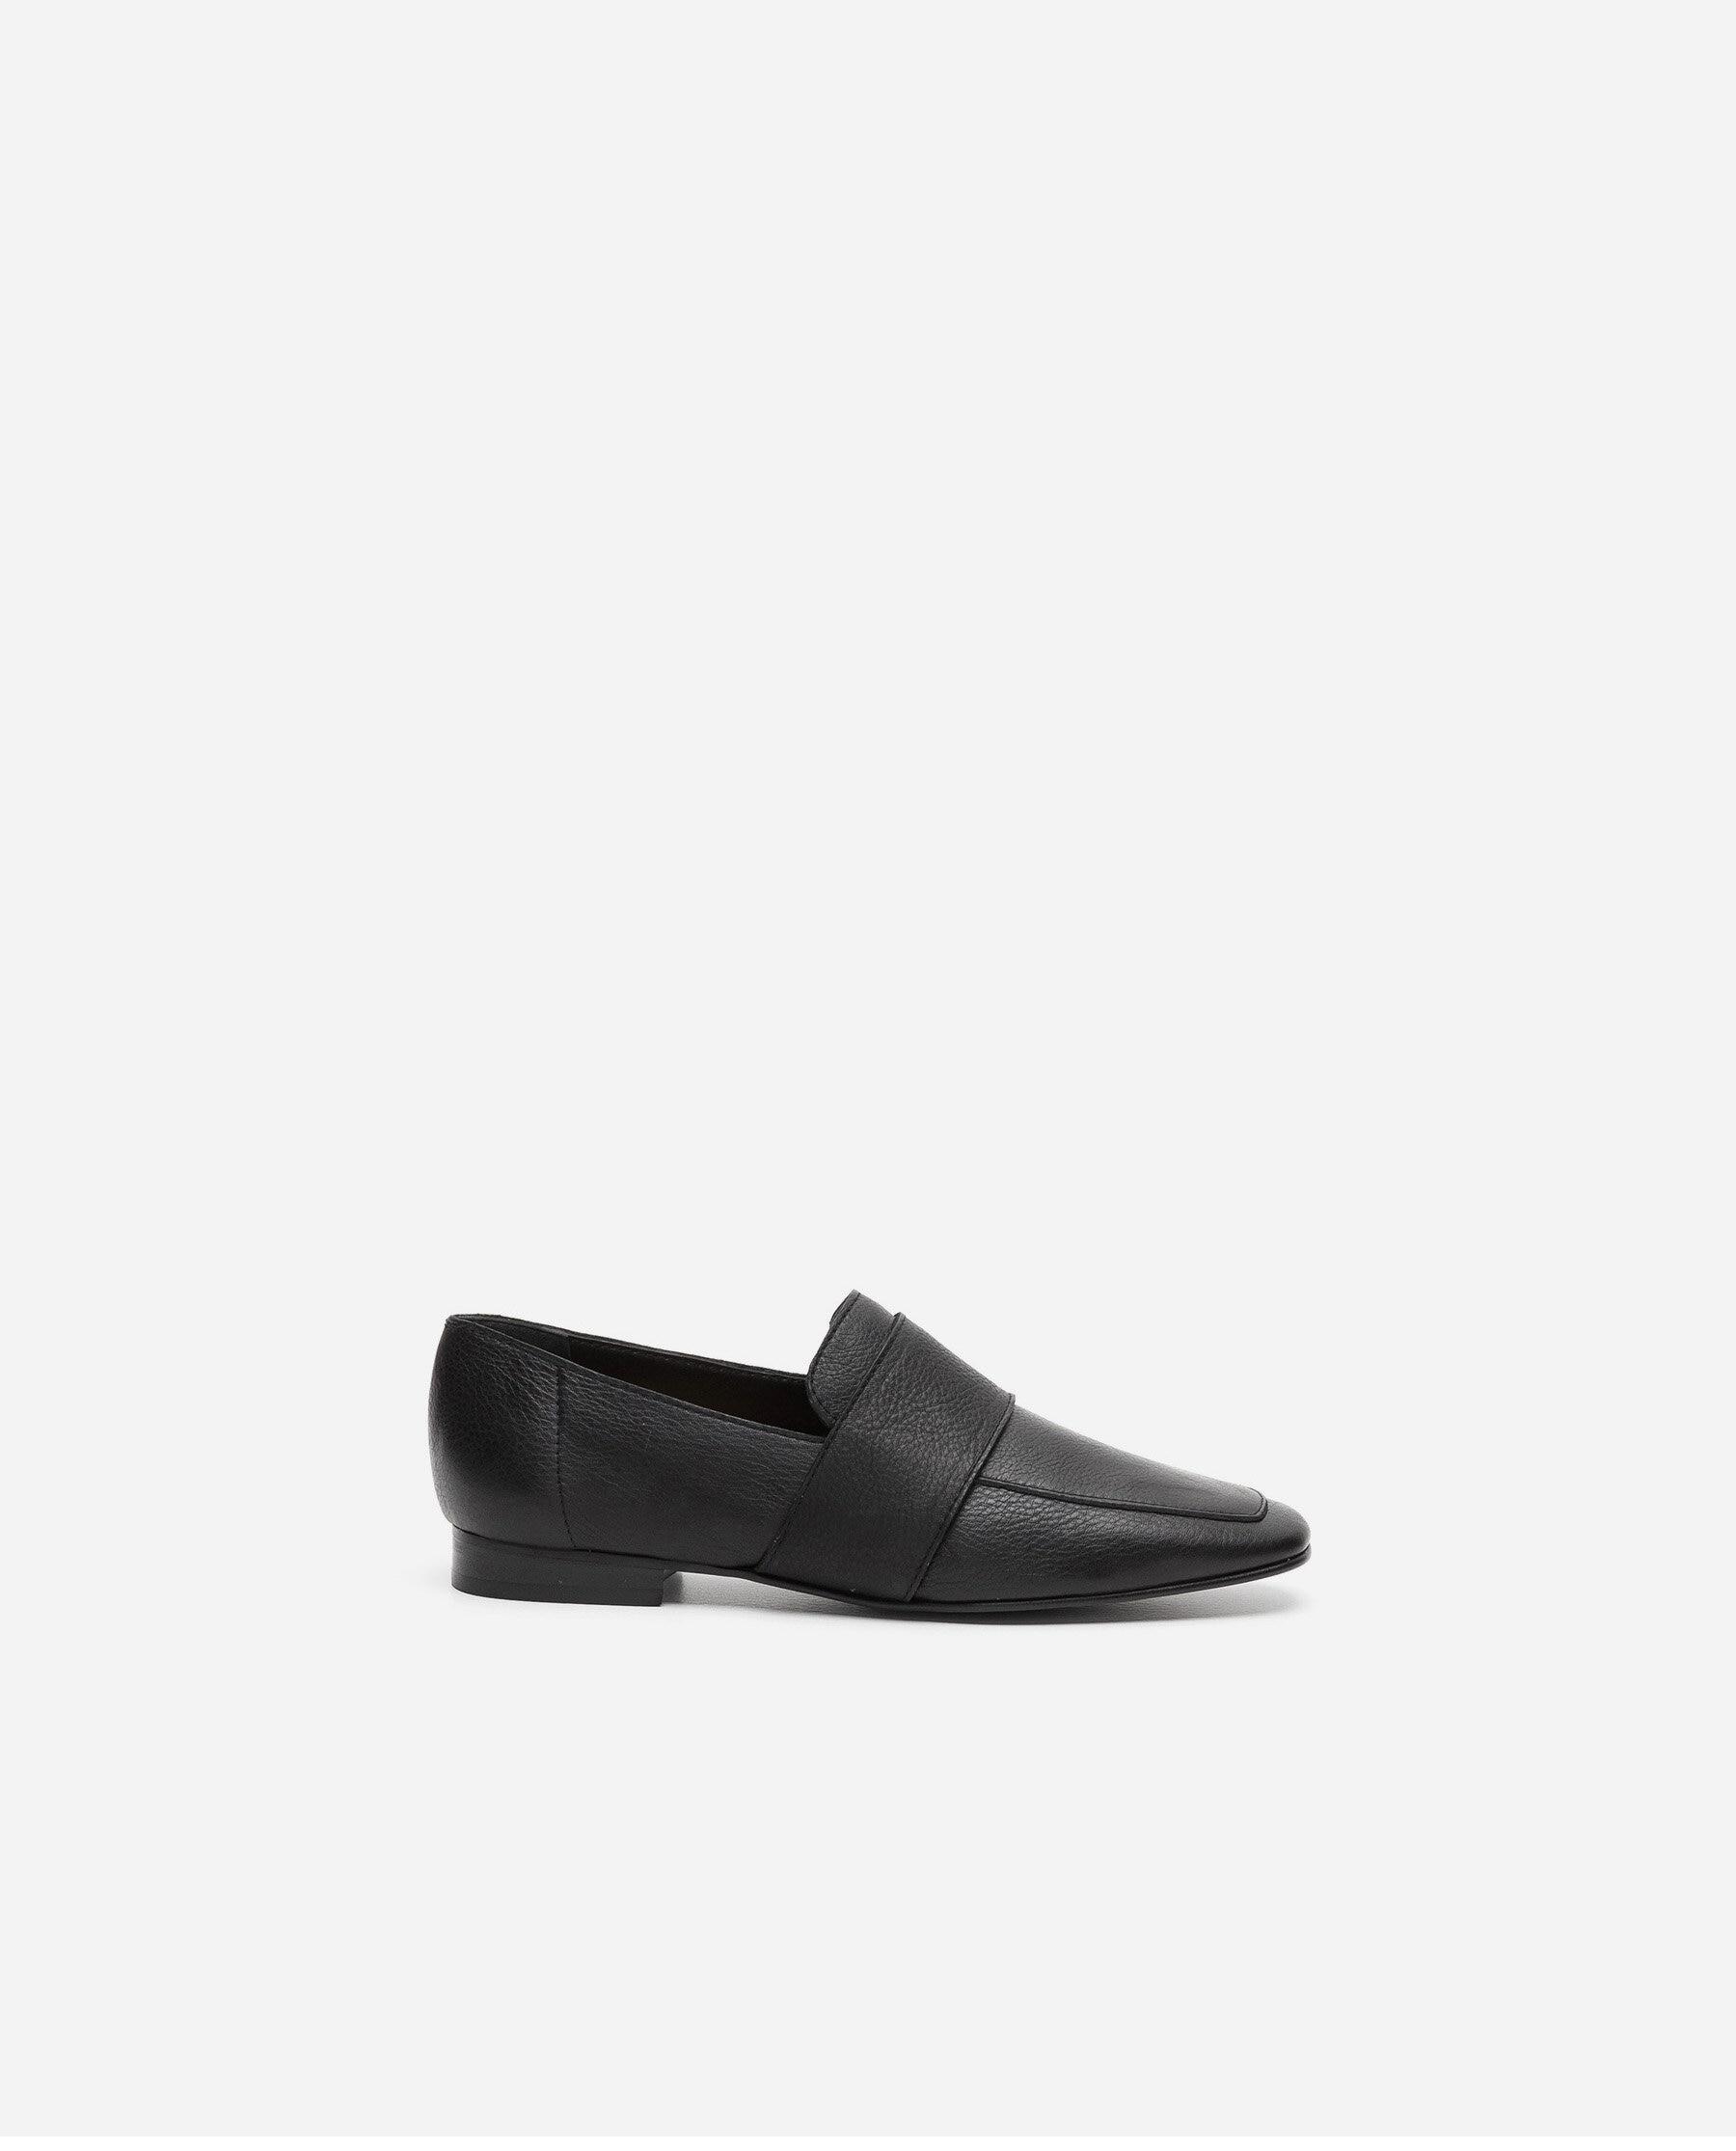 Vivi Leather Black